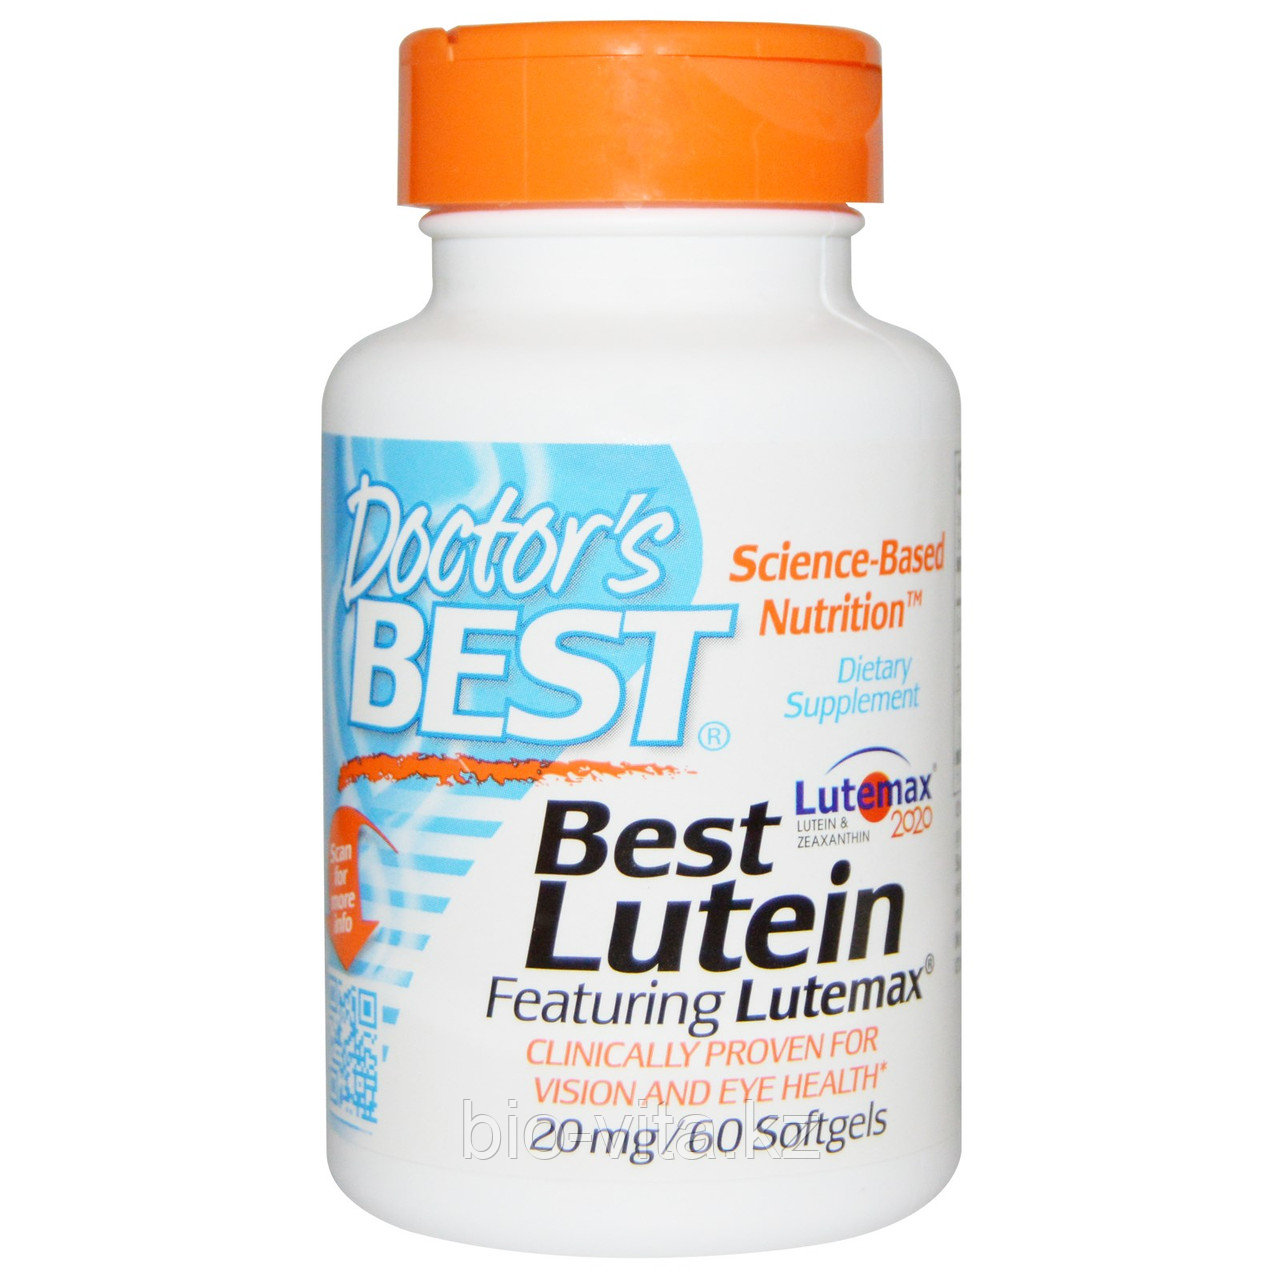 Doctor's Best, Best Lutein Лучший лютеин для здоровья глаз, 20 mg, 60 капсул